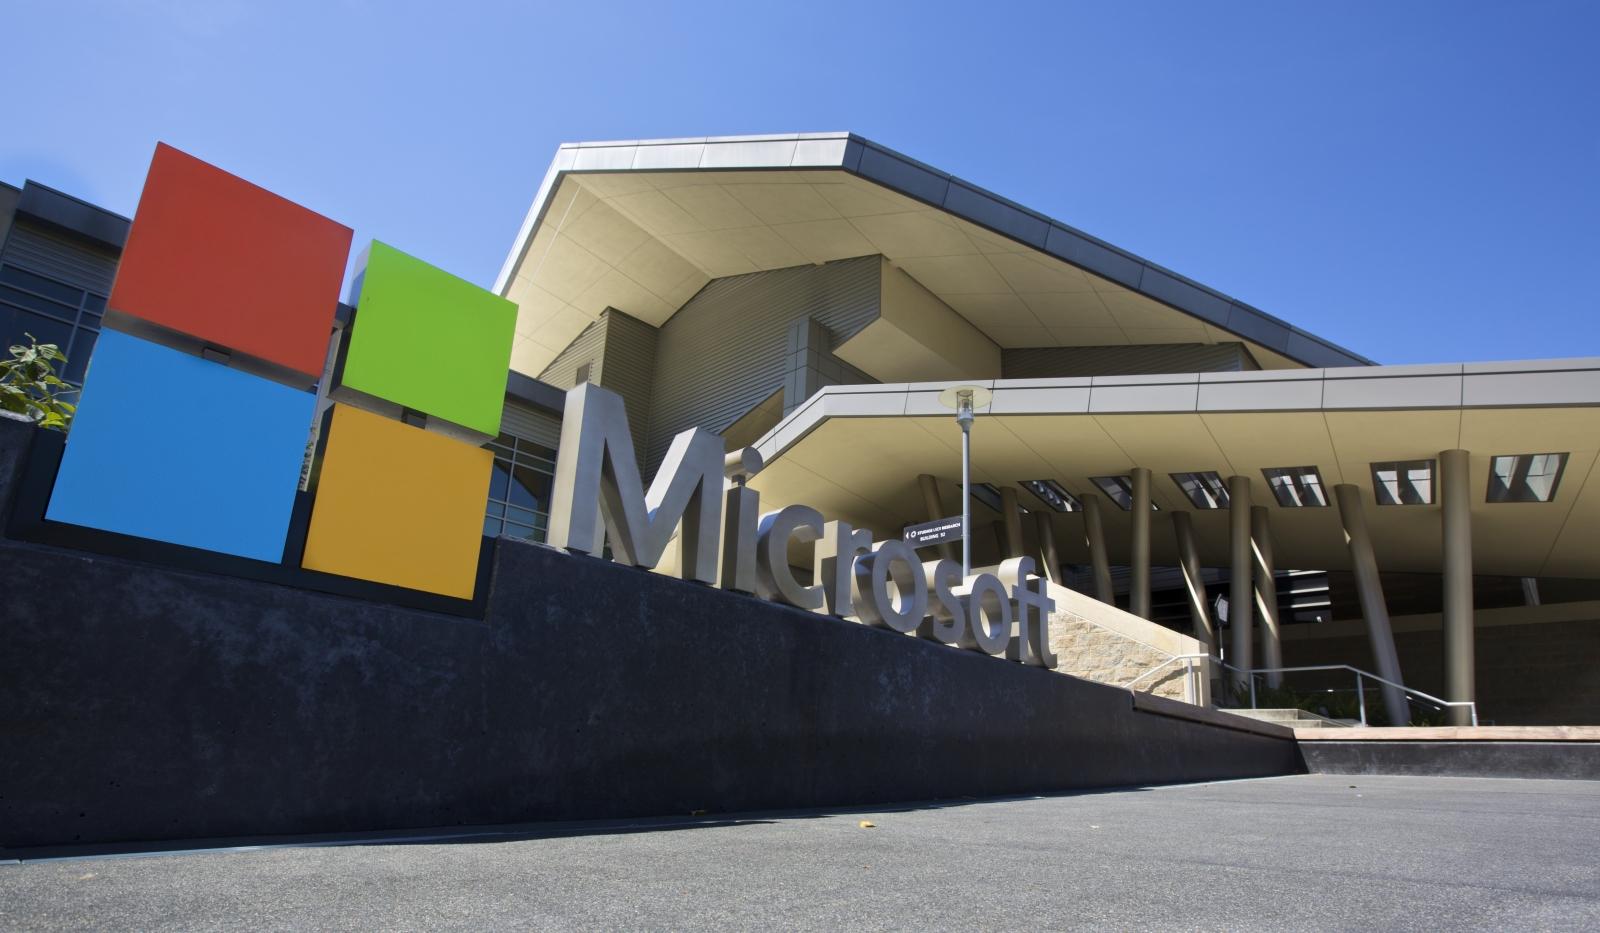 Microsoft Bing identify cancer?